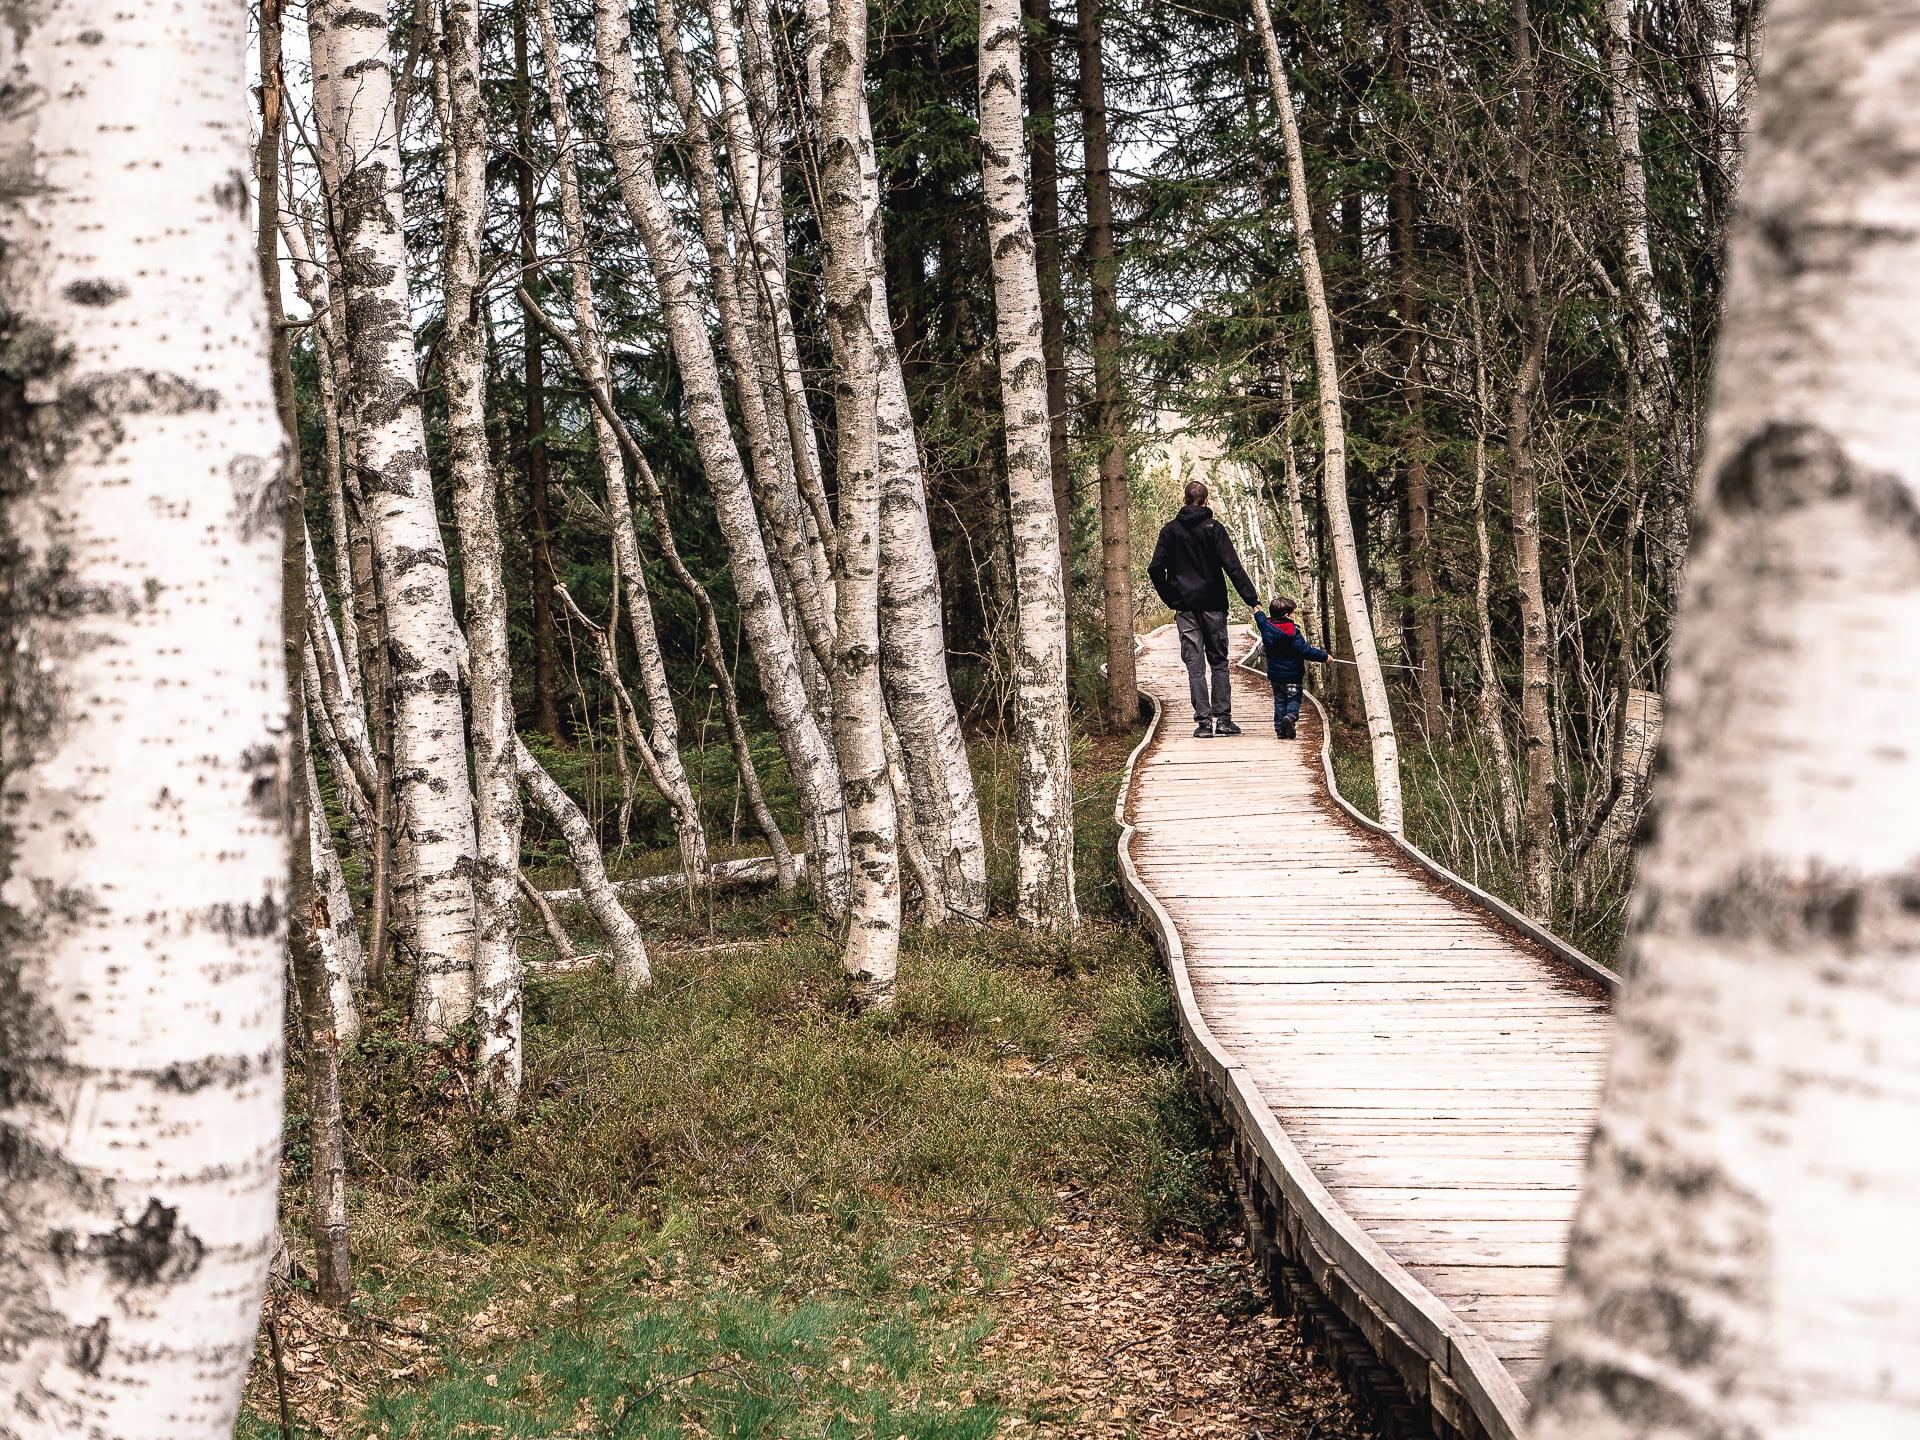 Sumava 52914 - Les globe blogueurs - blog voyage nature